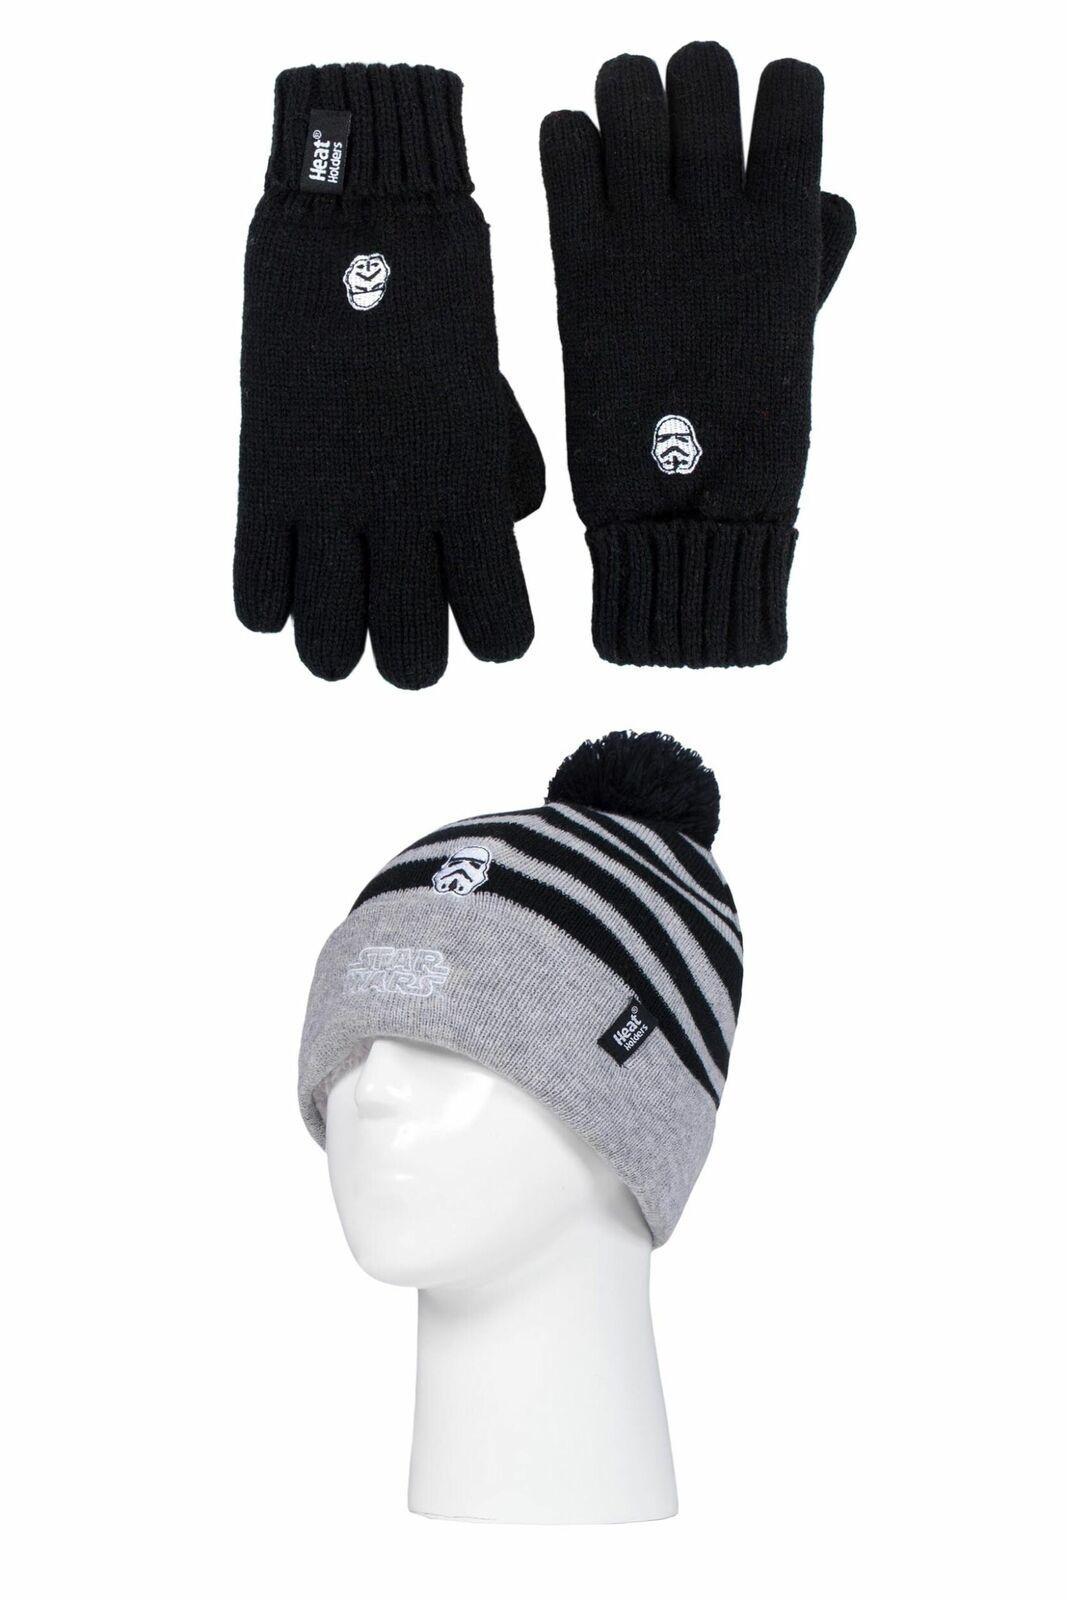 Kids 1 Pack SOCKSHOP Heat Holders Disney Star Wars Hat & Glove Set